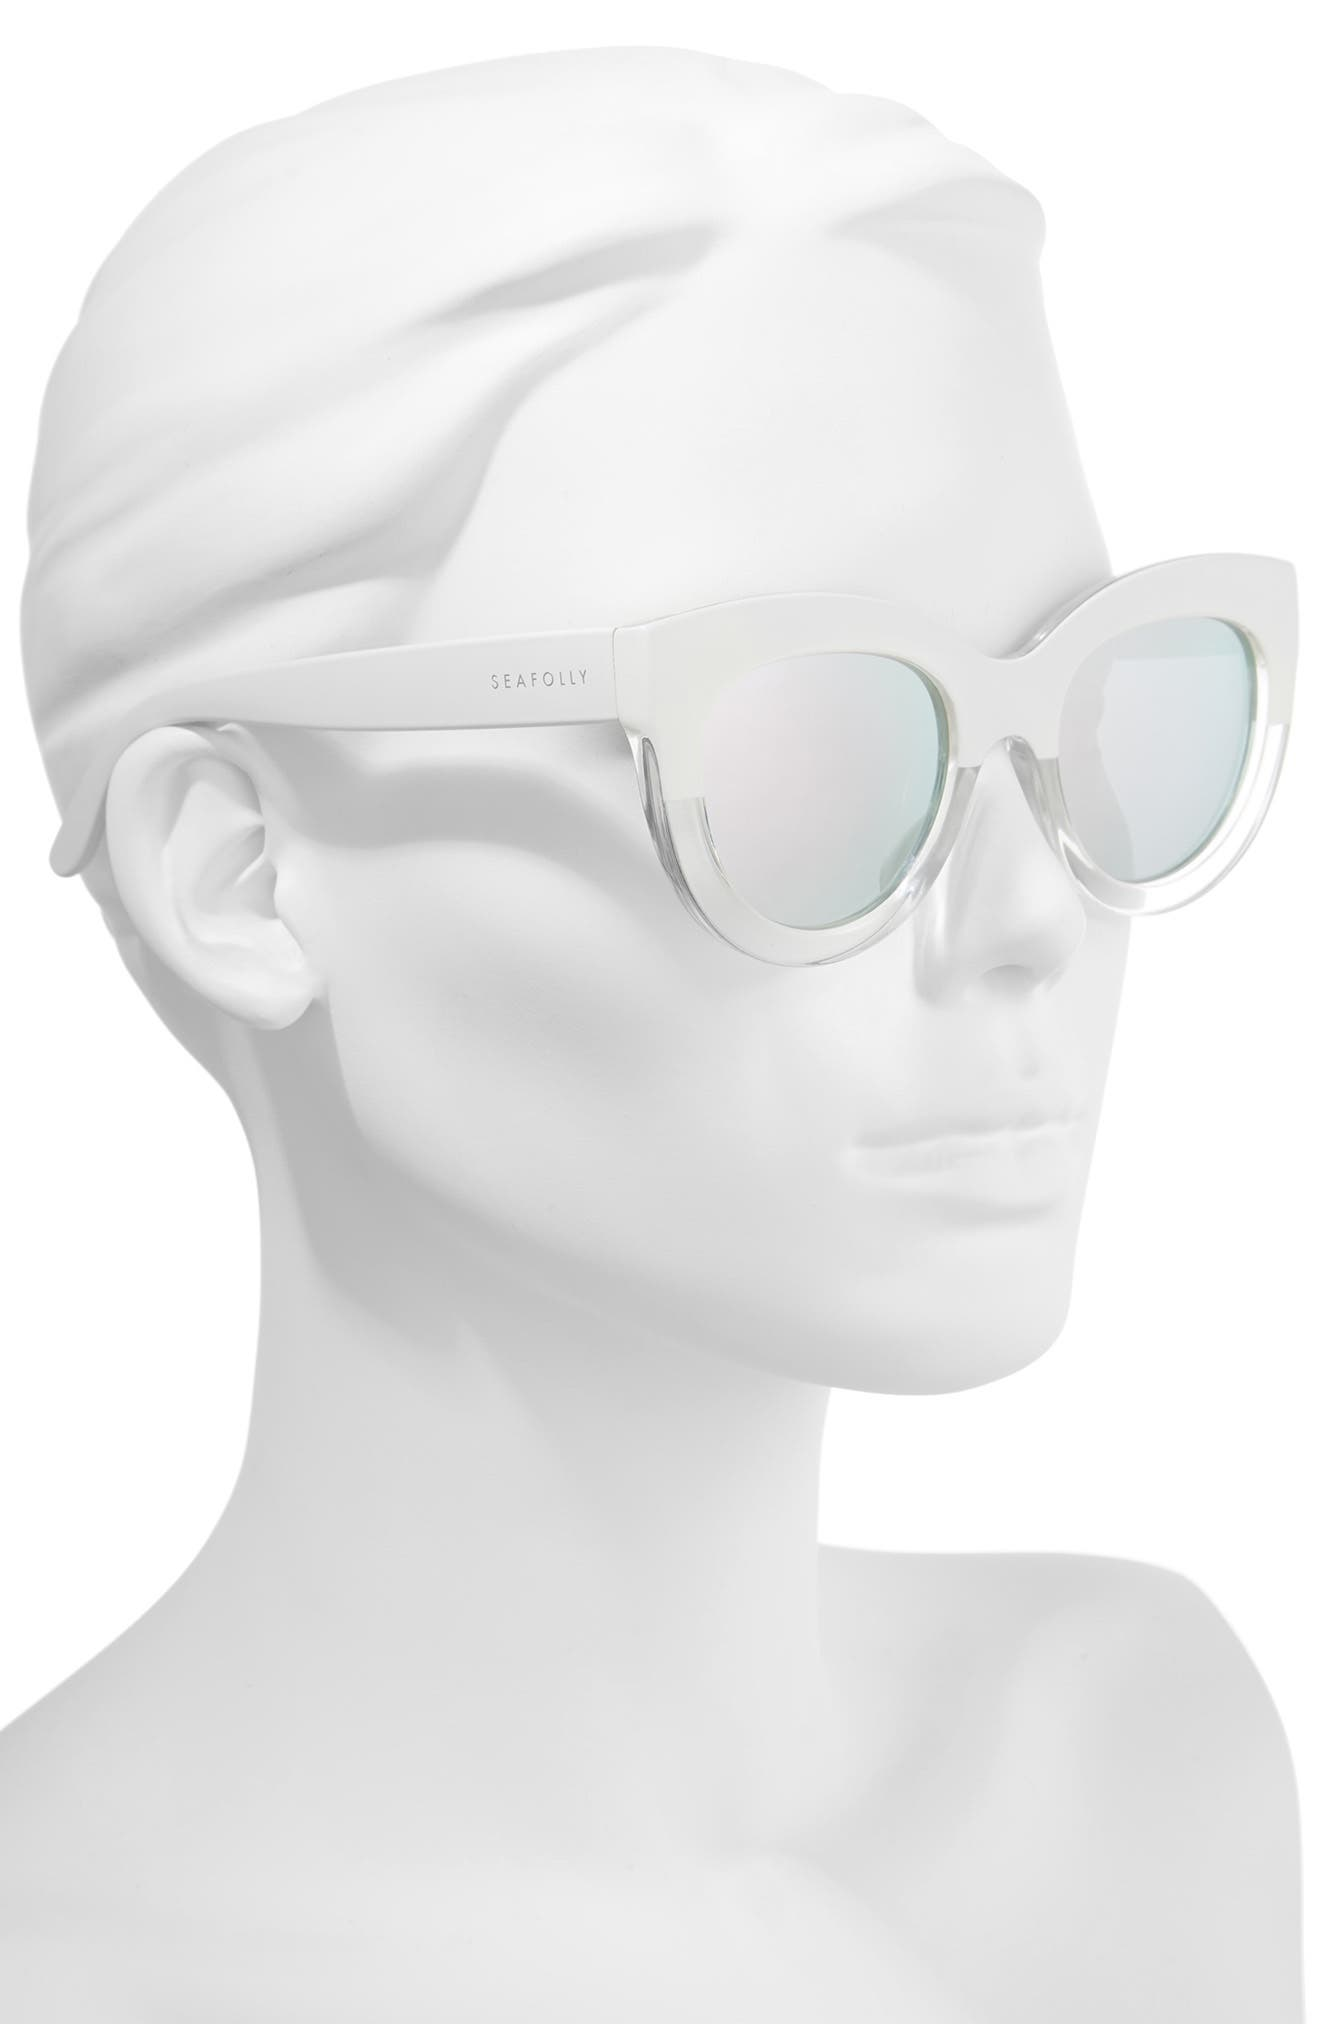 Tortola V2 51mm Polarized Cat Eye Sunglasses,                             Alternate thumbnail 2, color,                             White Splice